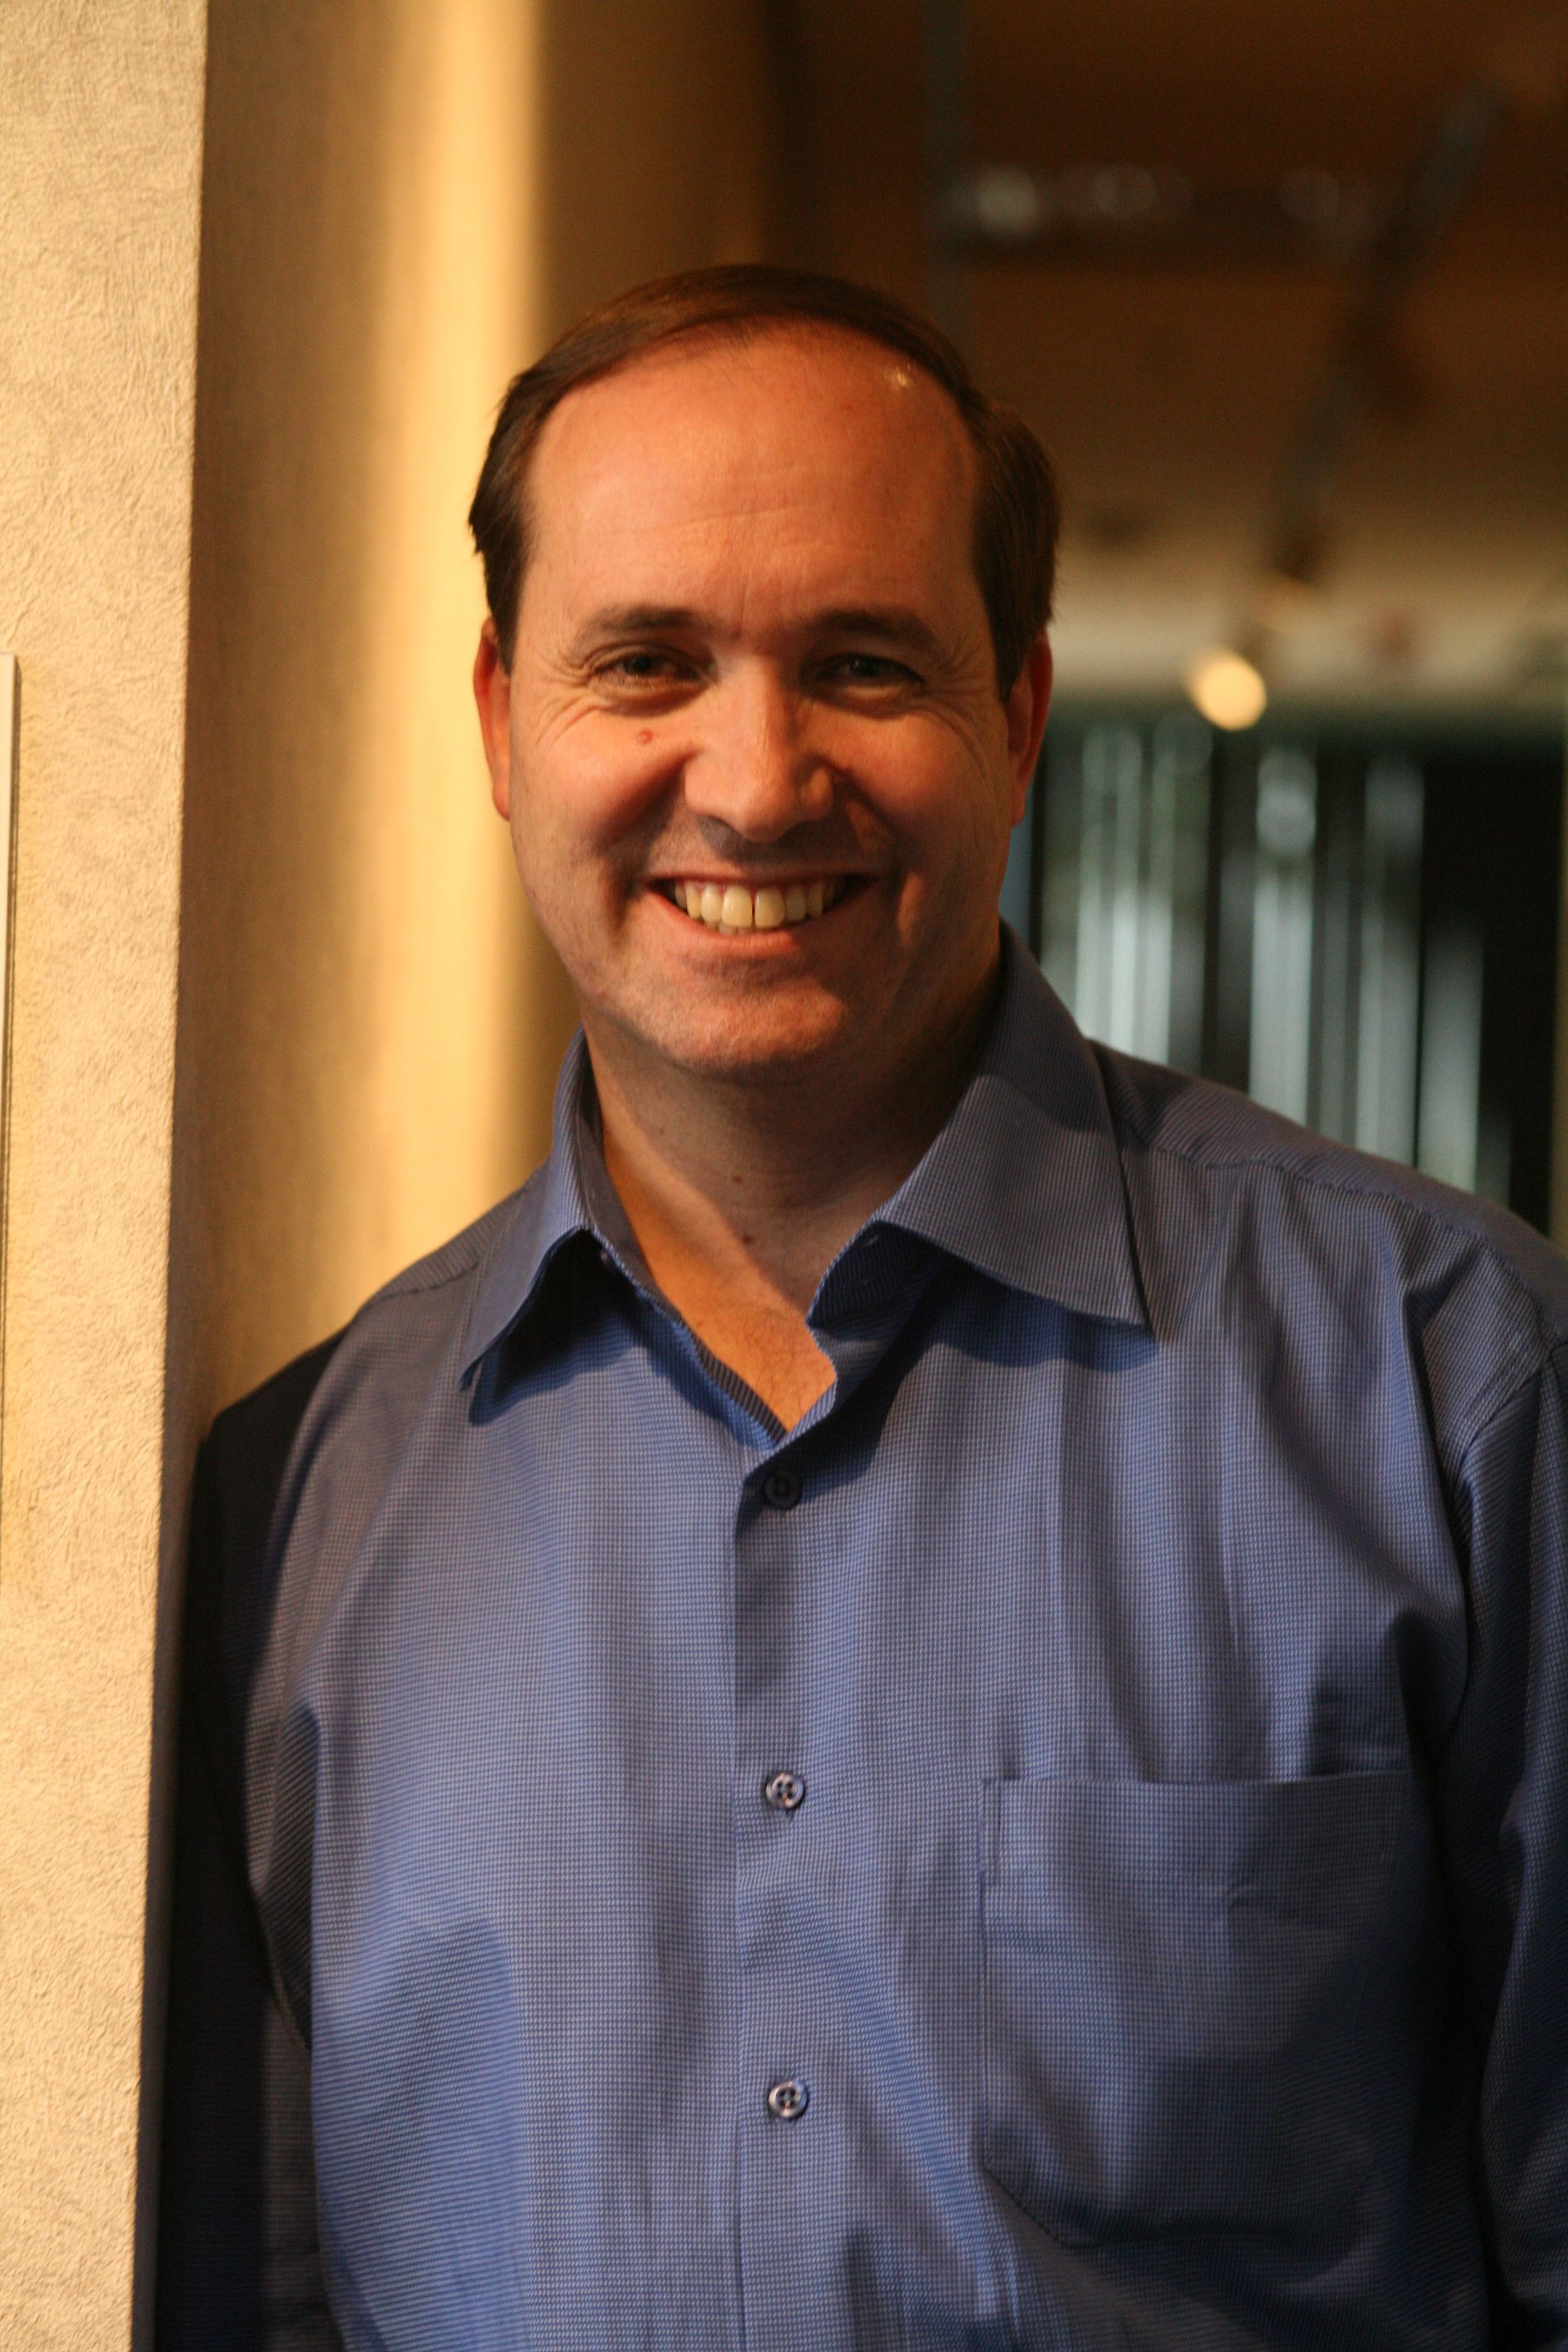 Executive Producer, Darrell Van Citters